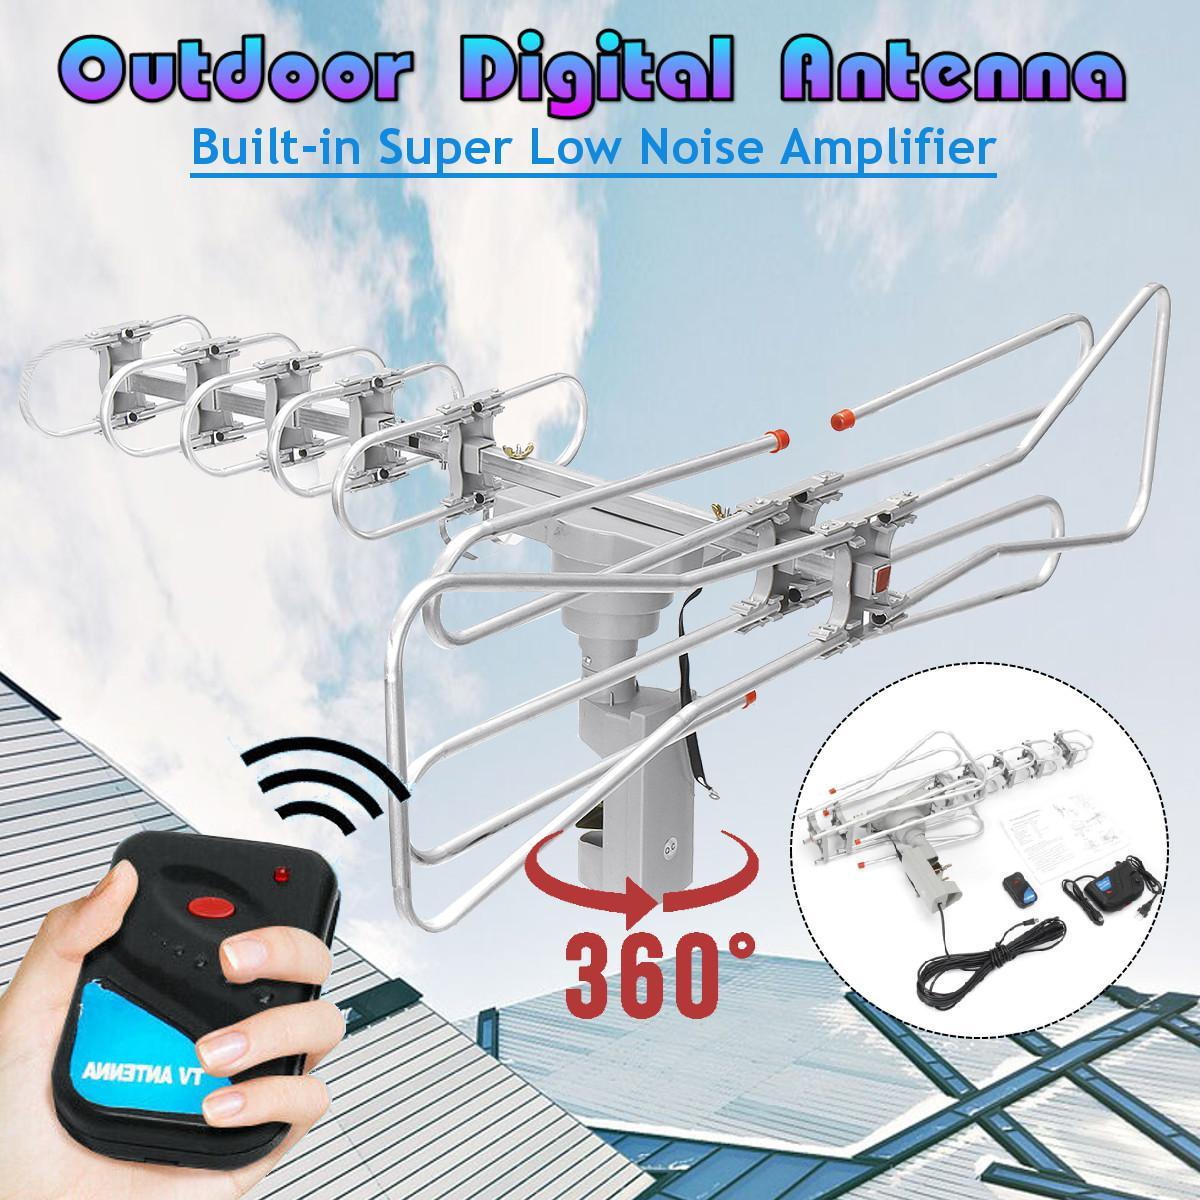 360 Degree HD Digital Outdoor TV Antenna For Full VHF/UHF/DTV/HDTV/FM High Gain Strong Signal Outdoor TV Antenna